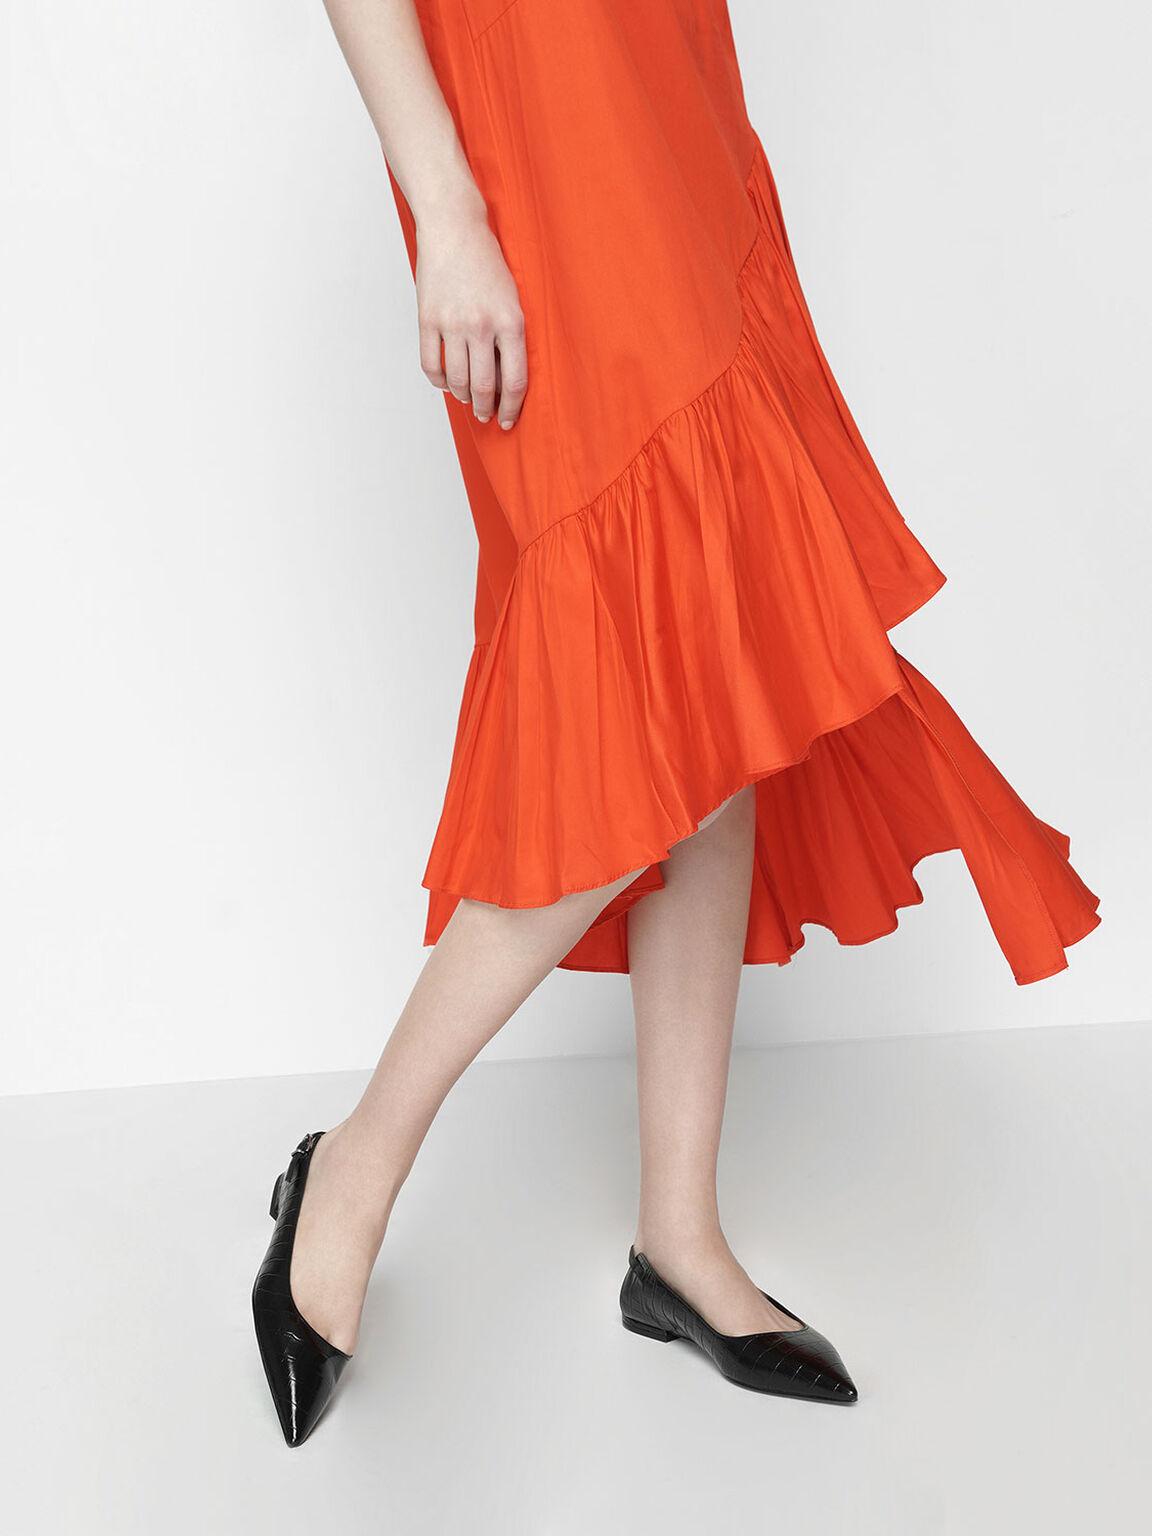 Croc-Effect Leather Ballerina Flats, Black, hi-res